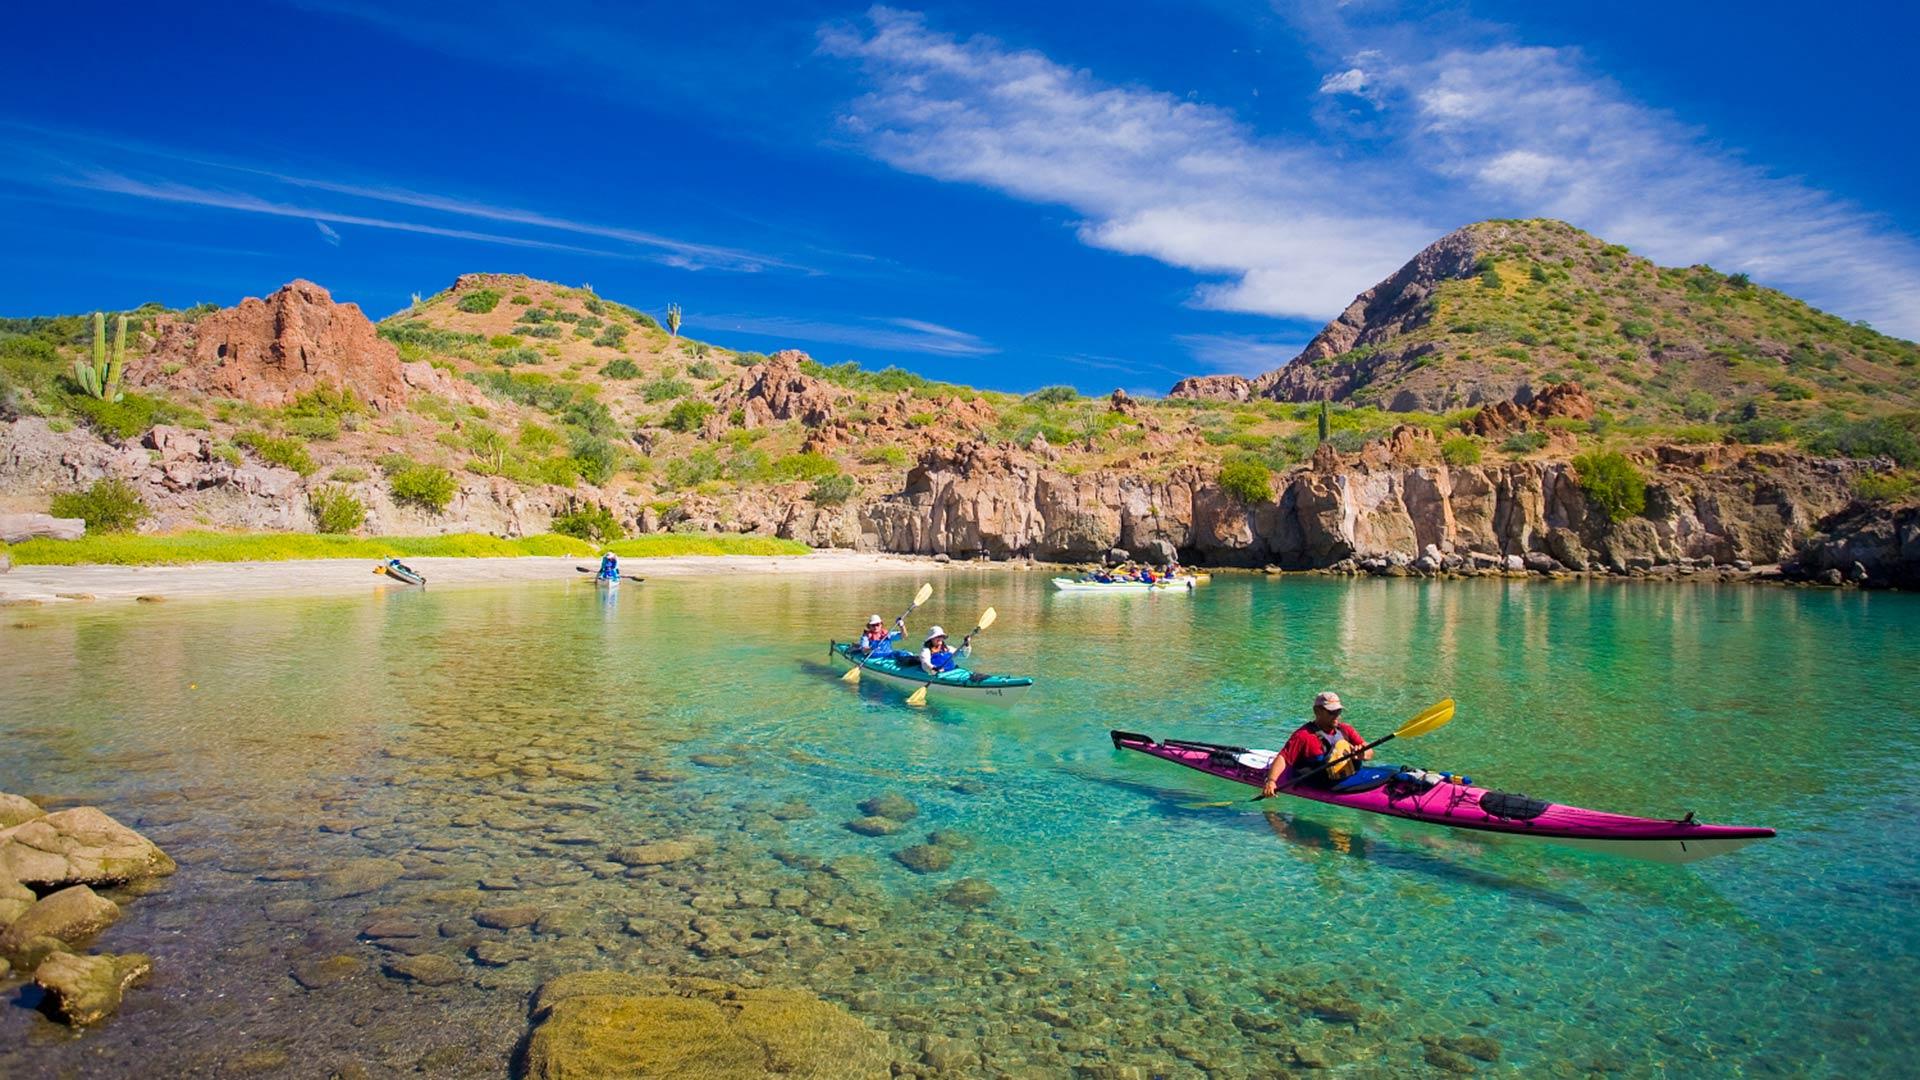 Sea Kayakers in Honeymoon Cove, Danzante Island